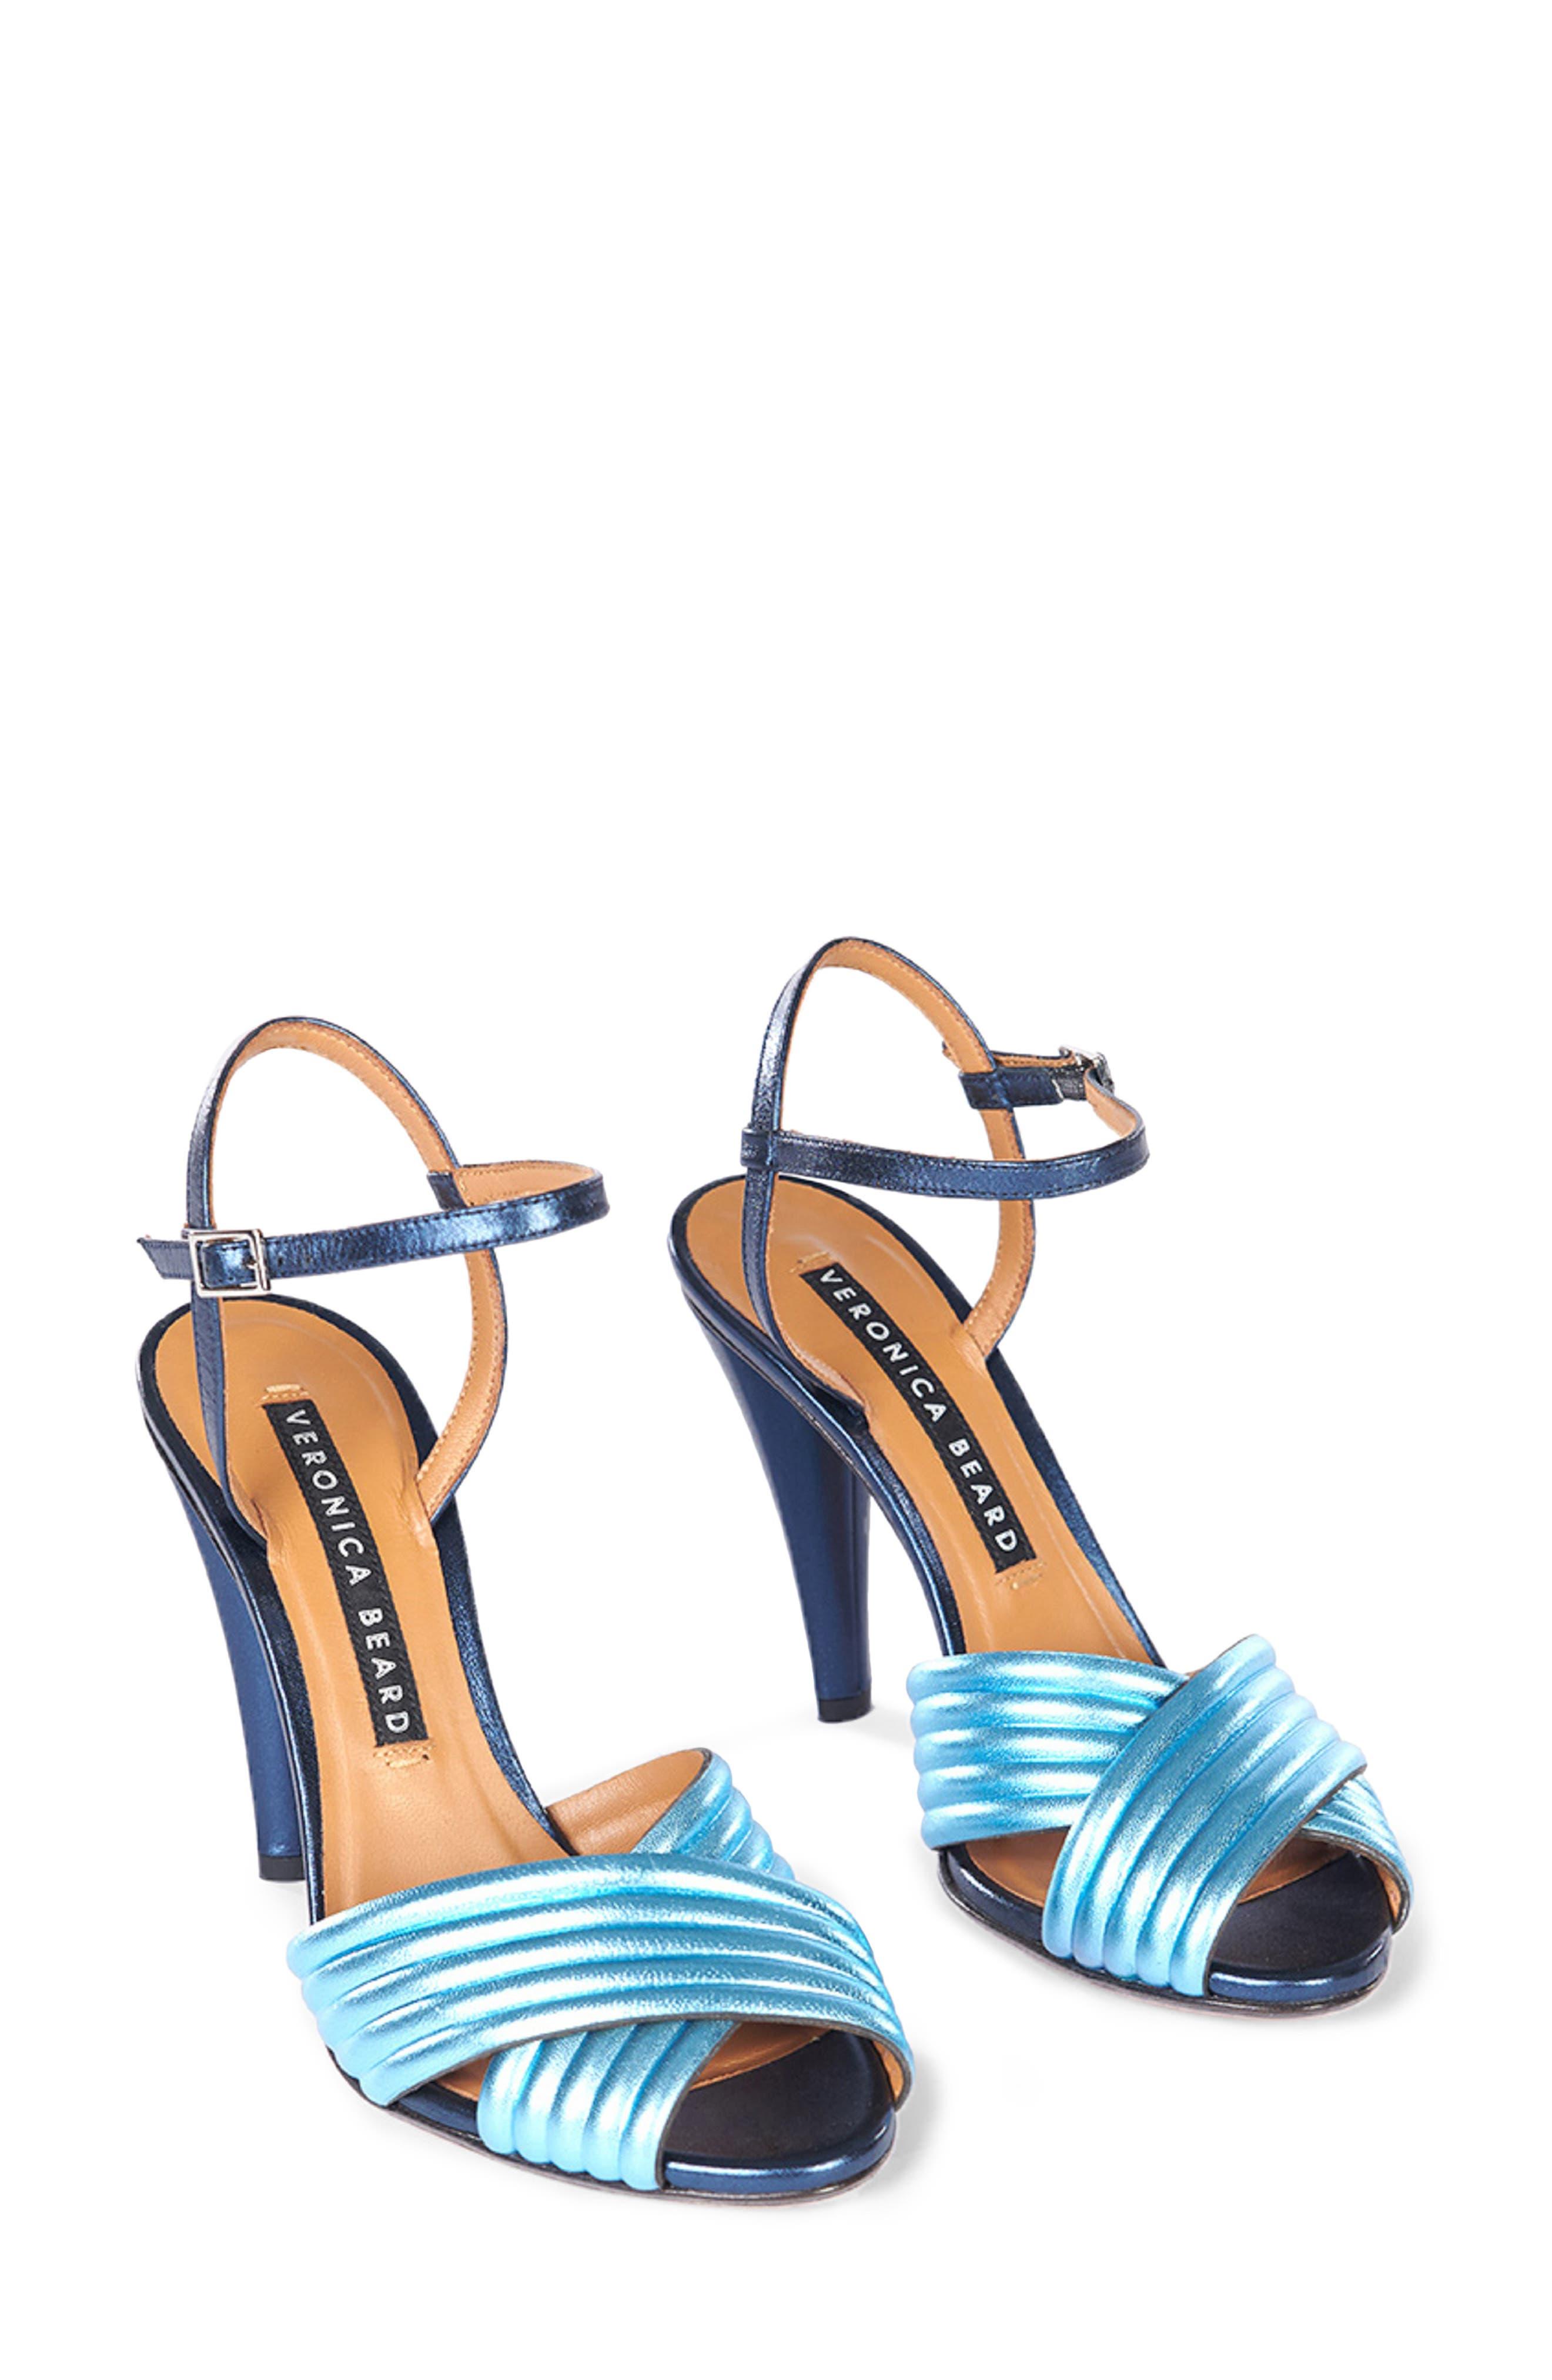 VERONICA BEARD, Olympia Quarter Strap Sandal, Main thumbnail 1, color, BLUE/ INDIGO